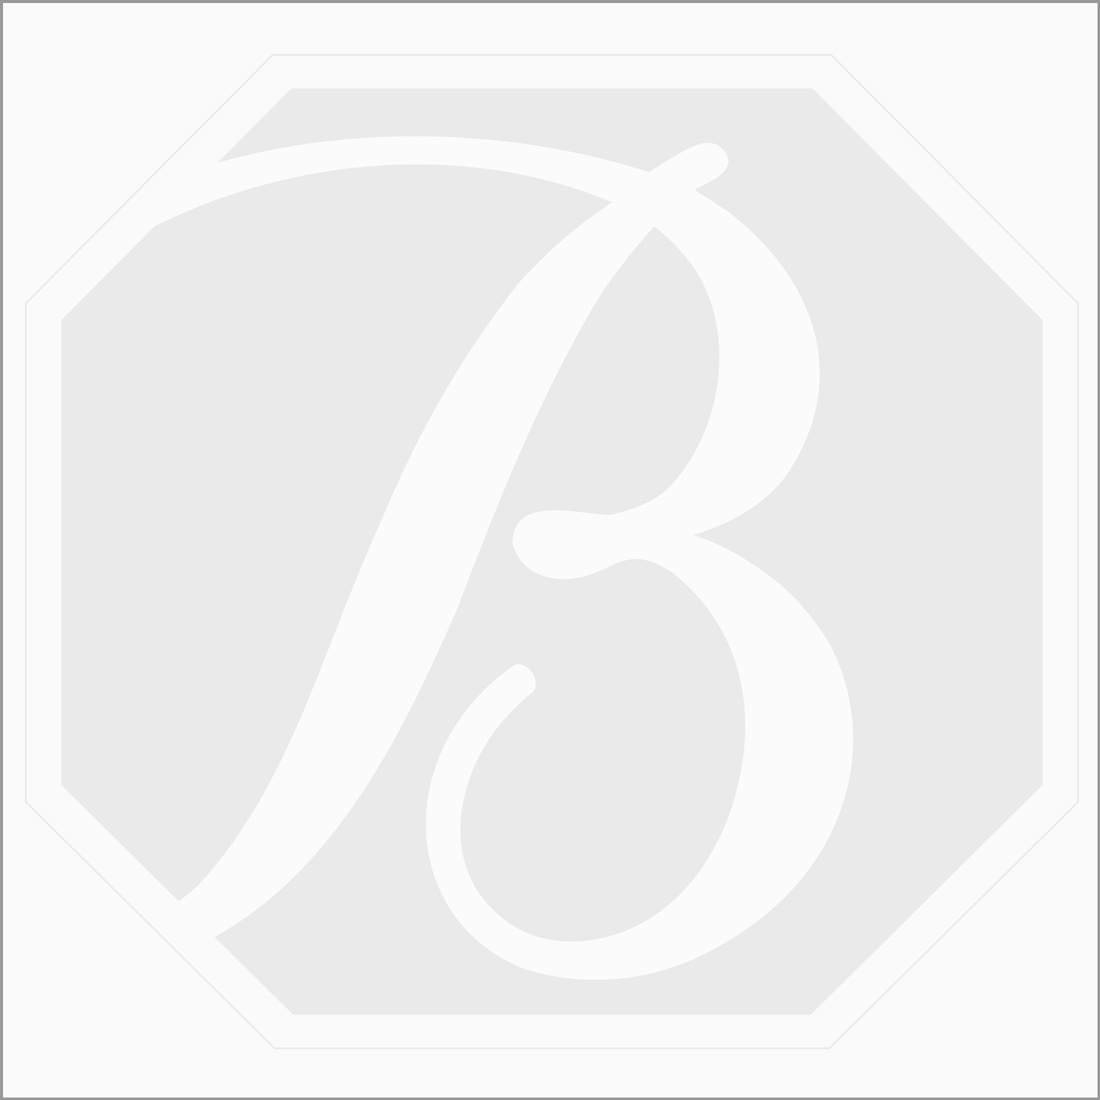 0.88 ct. Oval (J-VS1) White Rose Cut Diamond Photograph